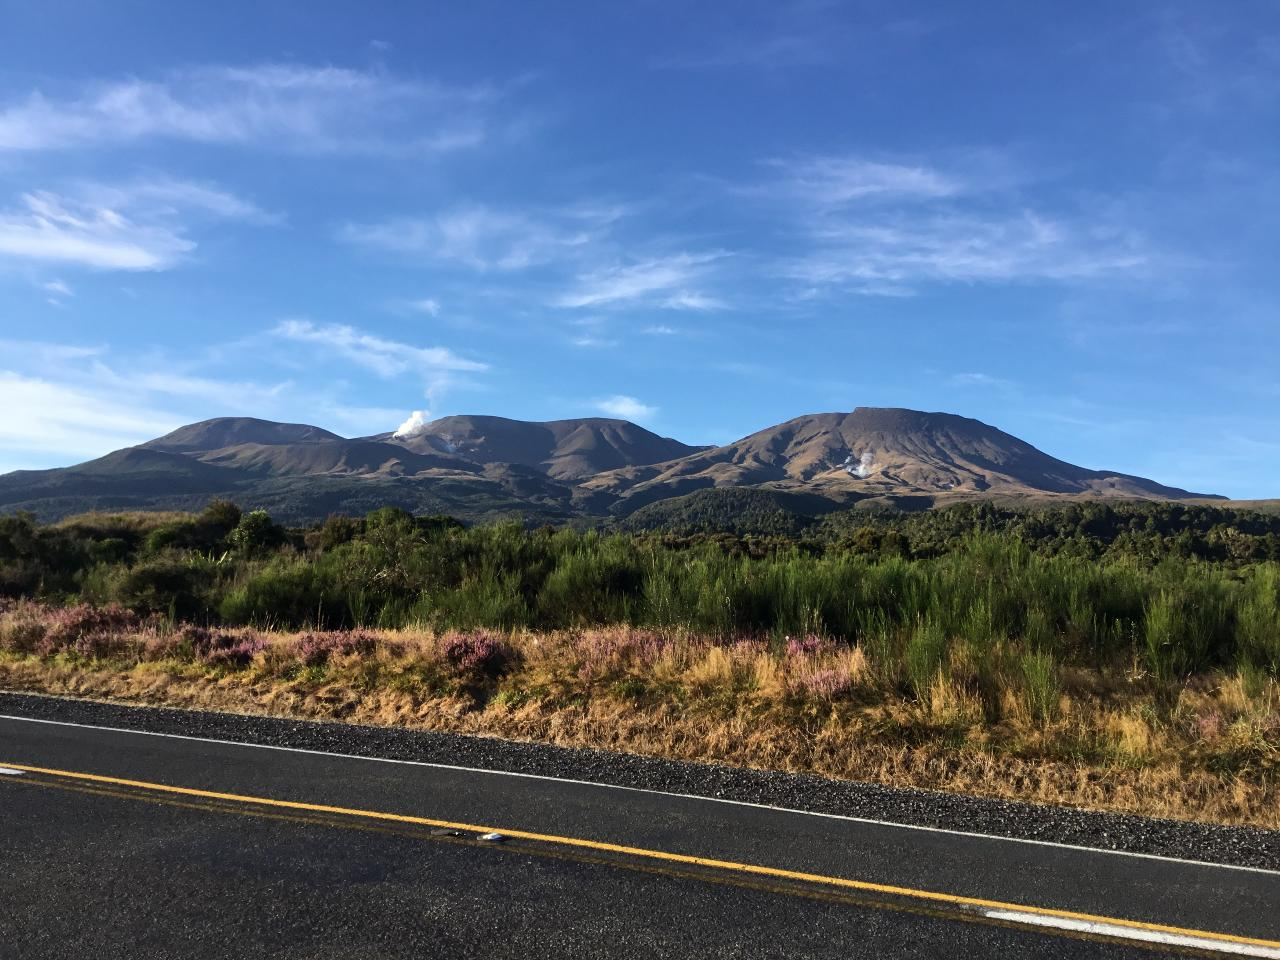 Tongariro Alpine Crossing Shuttle from Ketetahi (Summer Special) - One Way + Free Parking